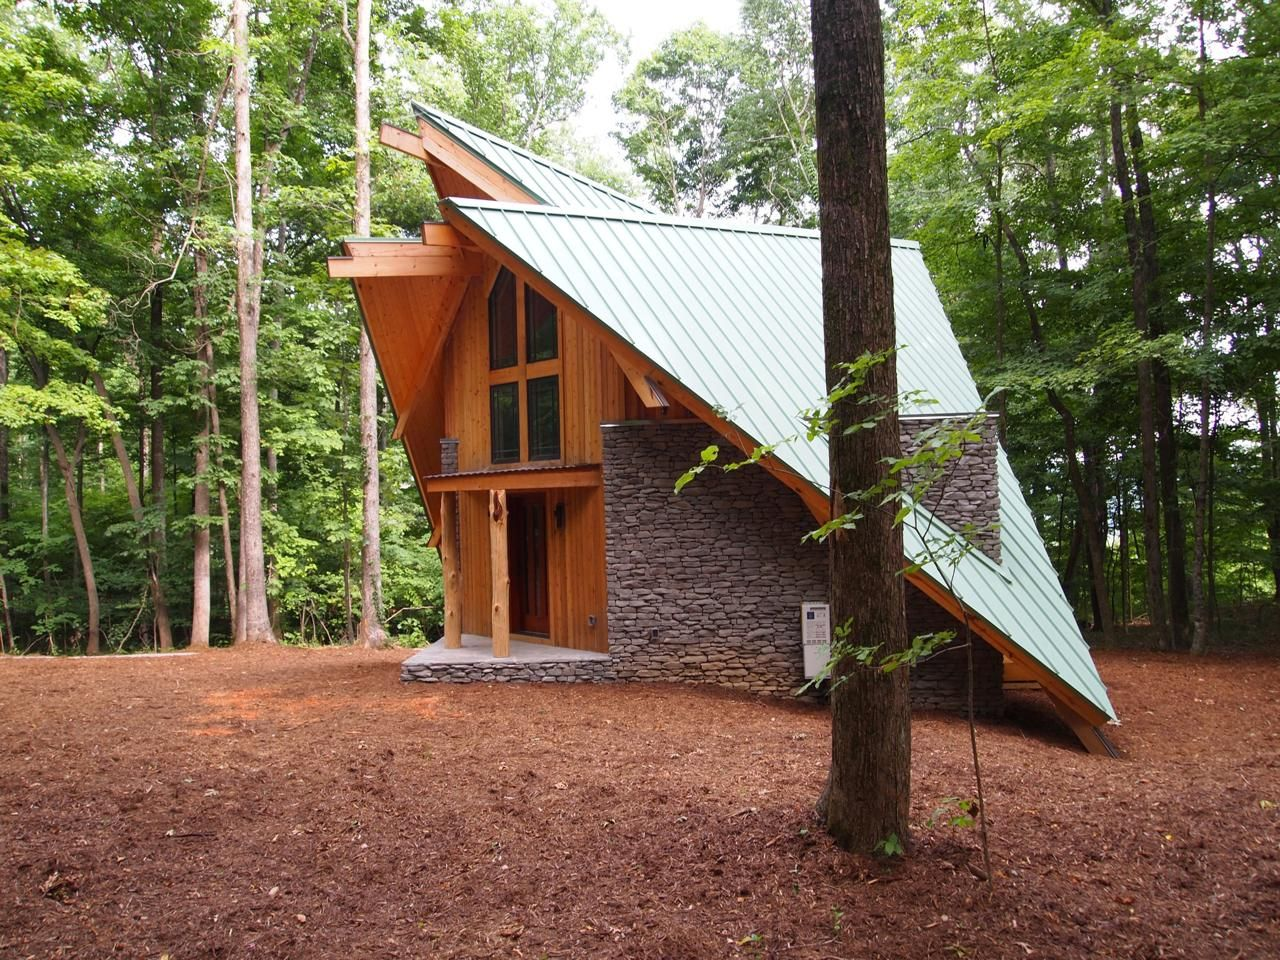 cabins cunningham cabin nashville sparta to welcome near mountain tn rentals